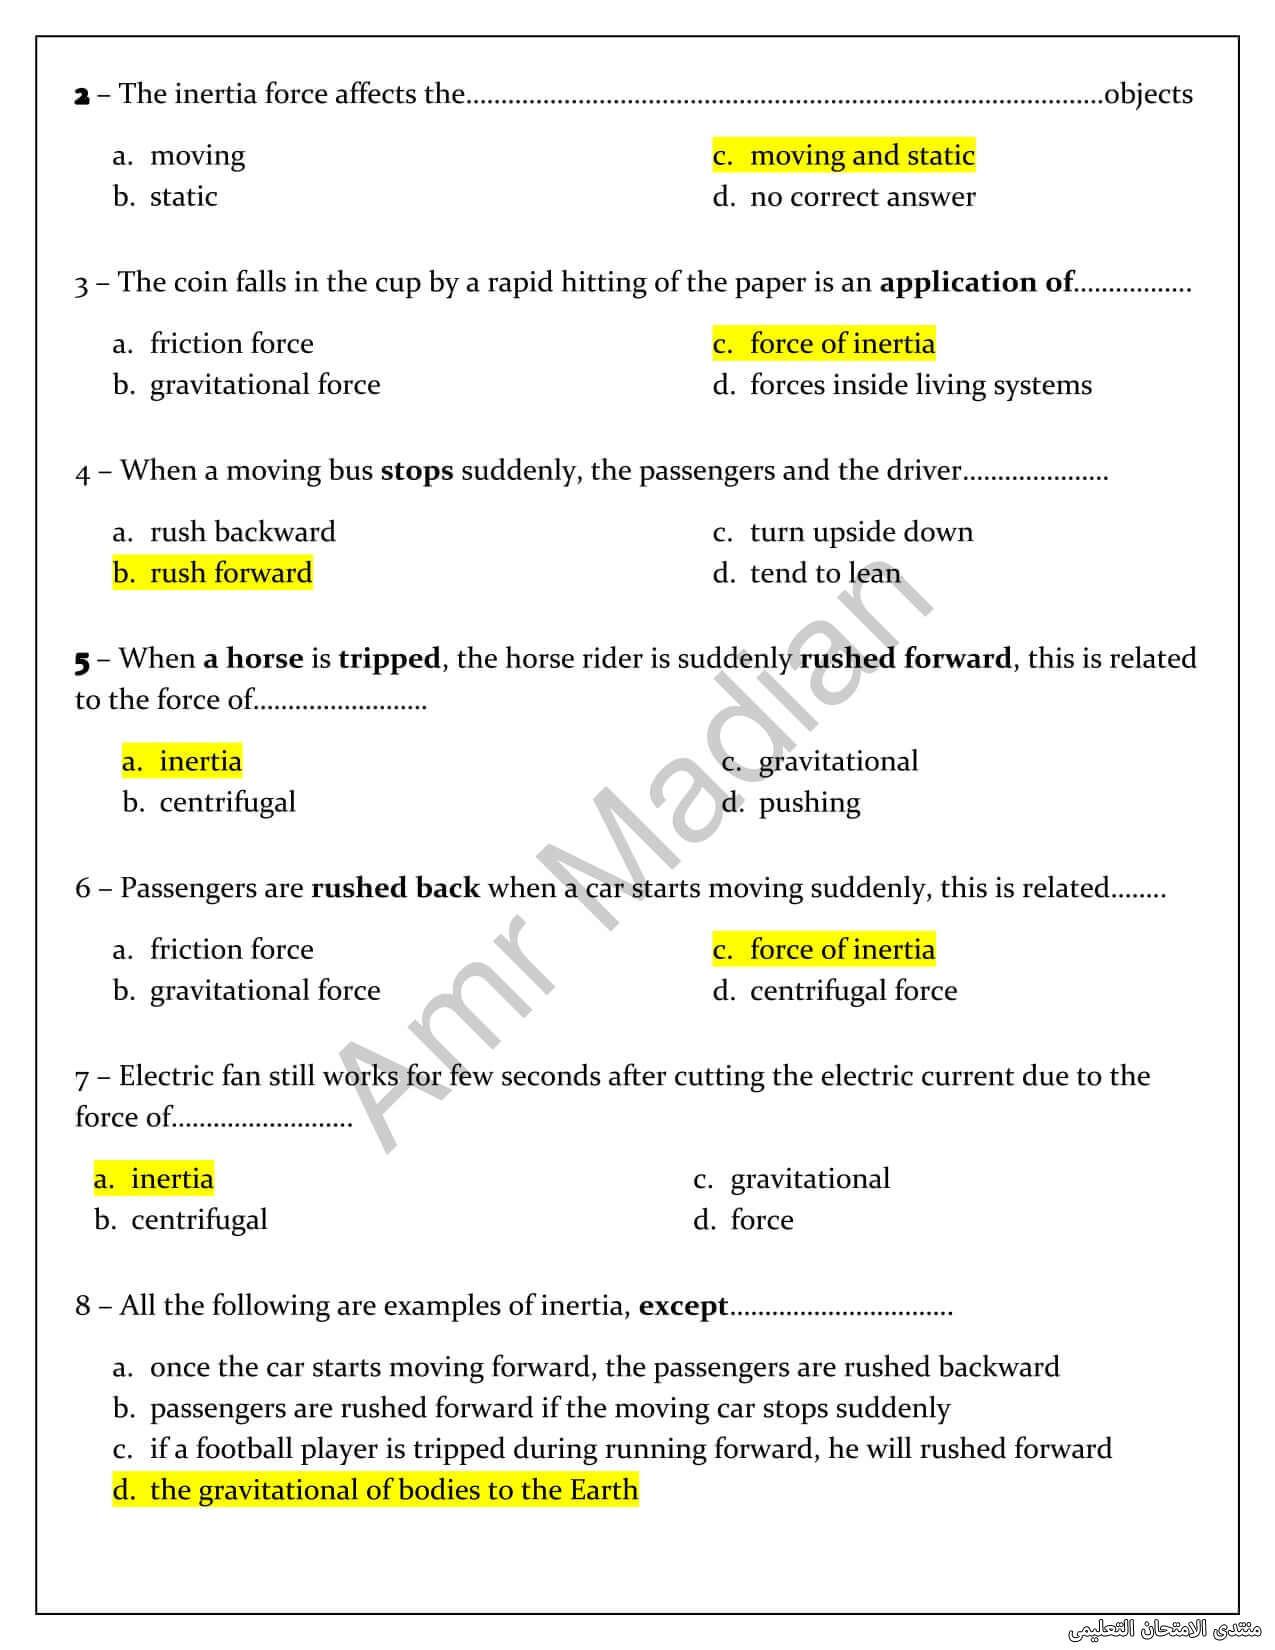 exam-eg.com_161958146703310.jpg